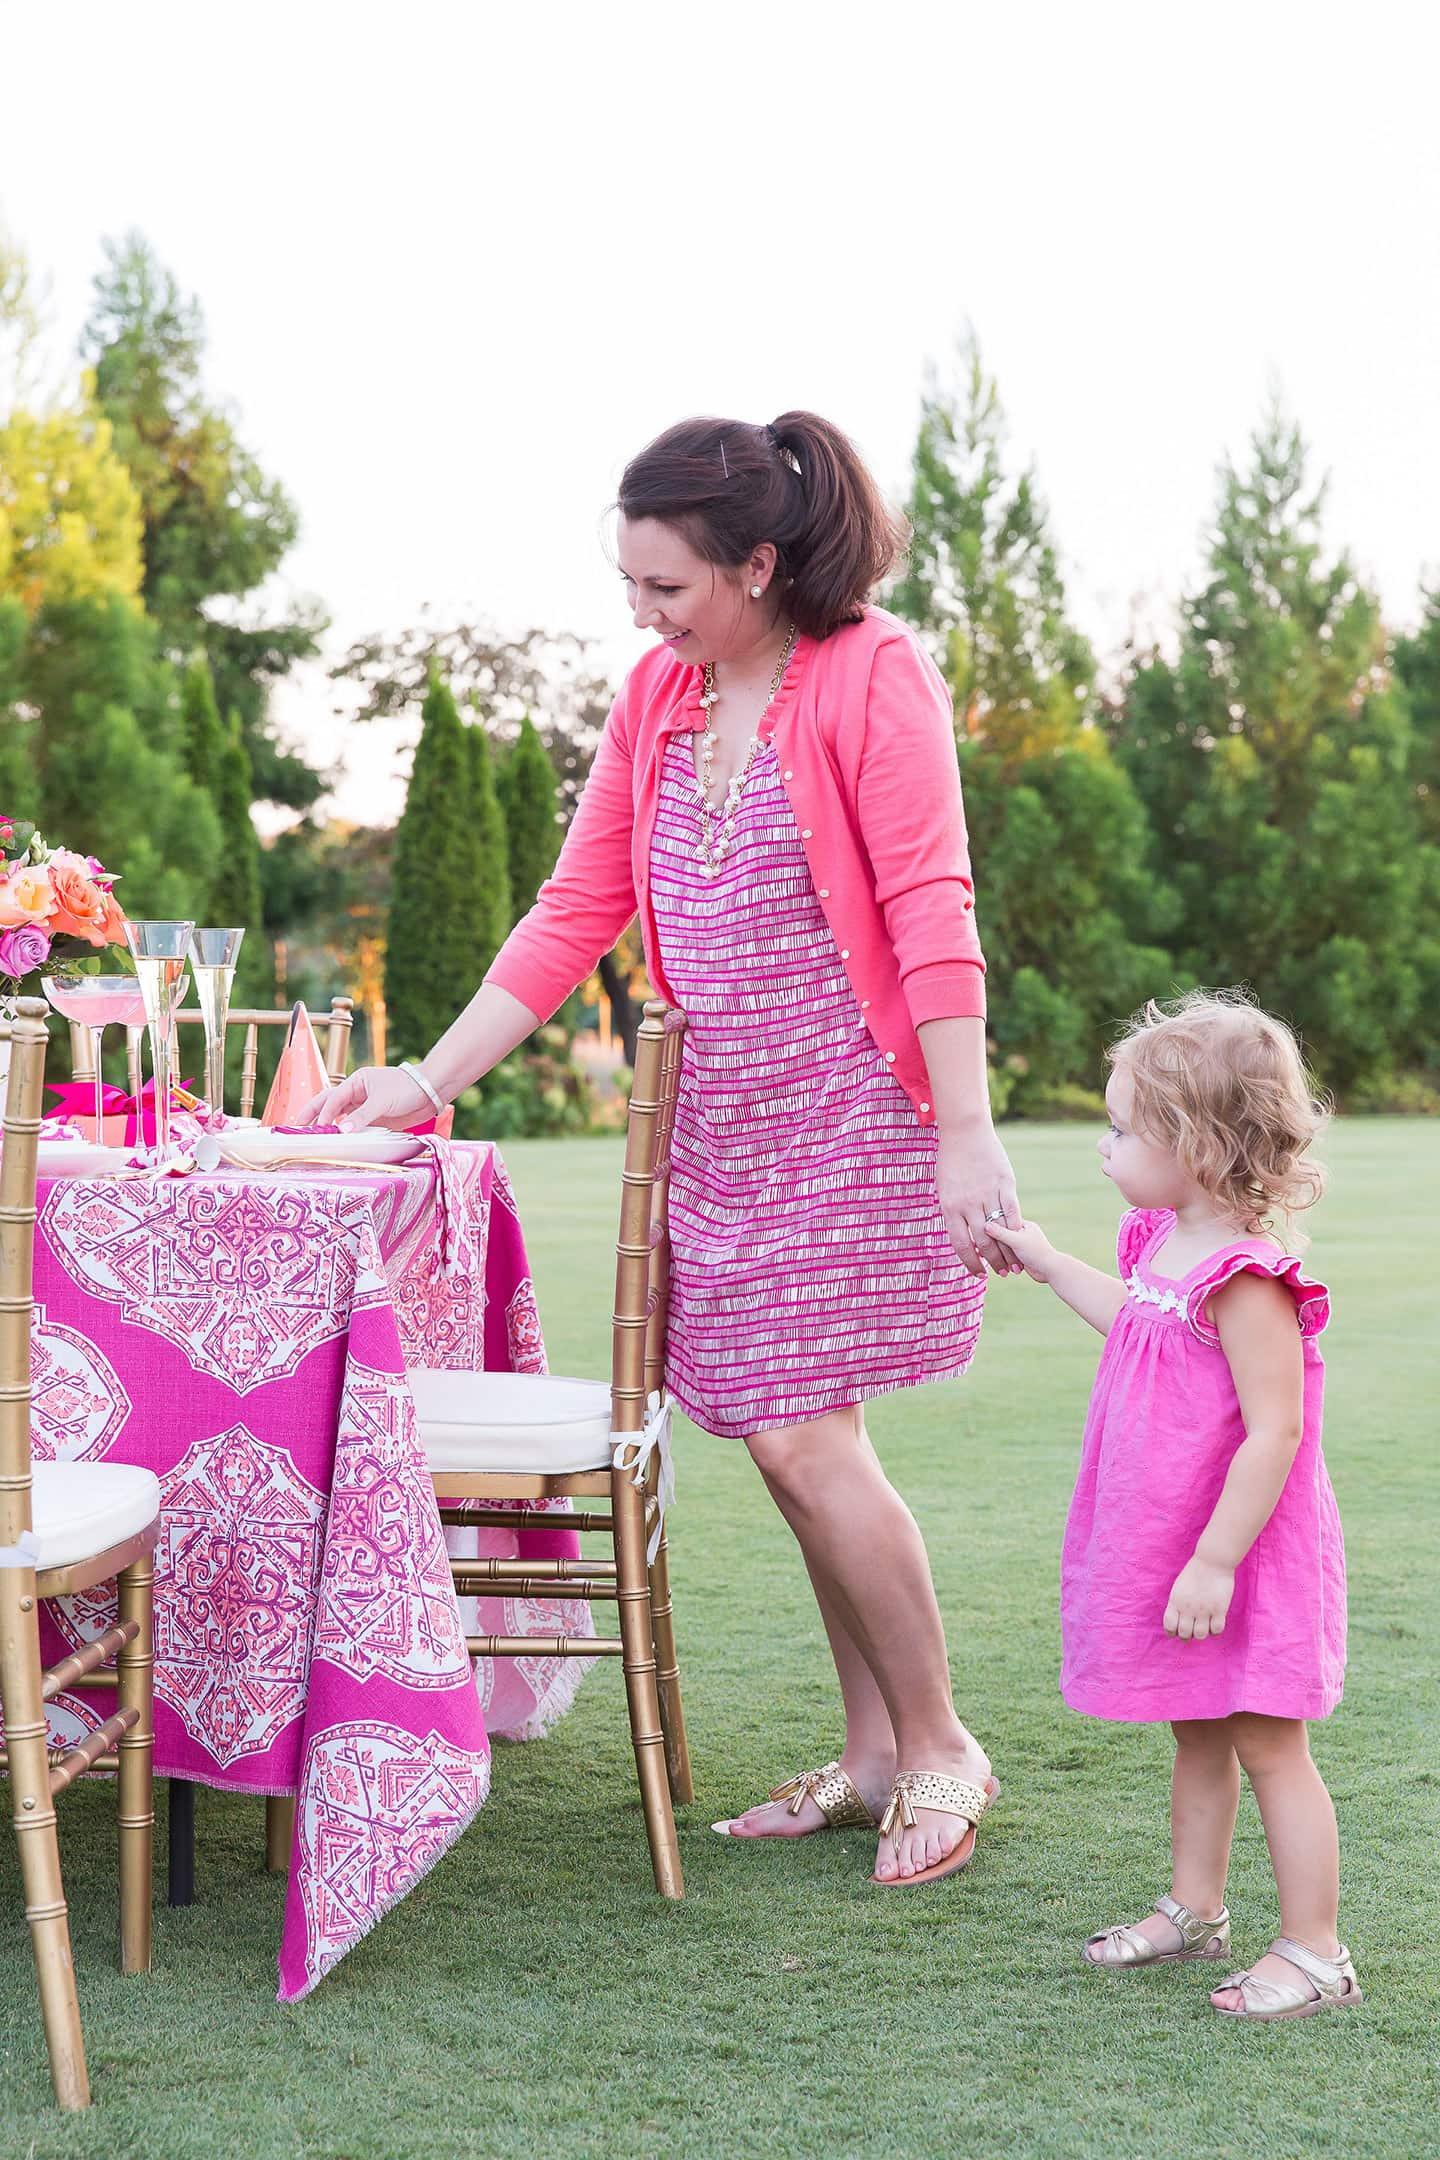 The Wild Journey of Motherhood